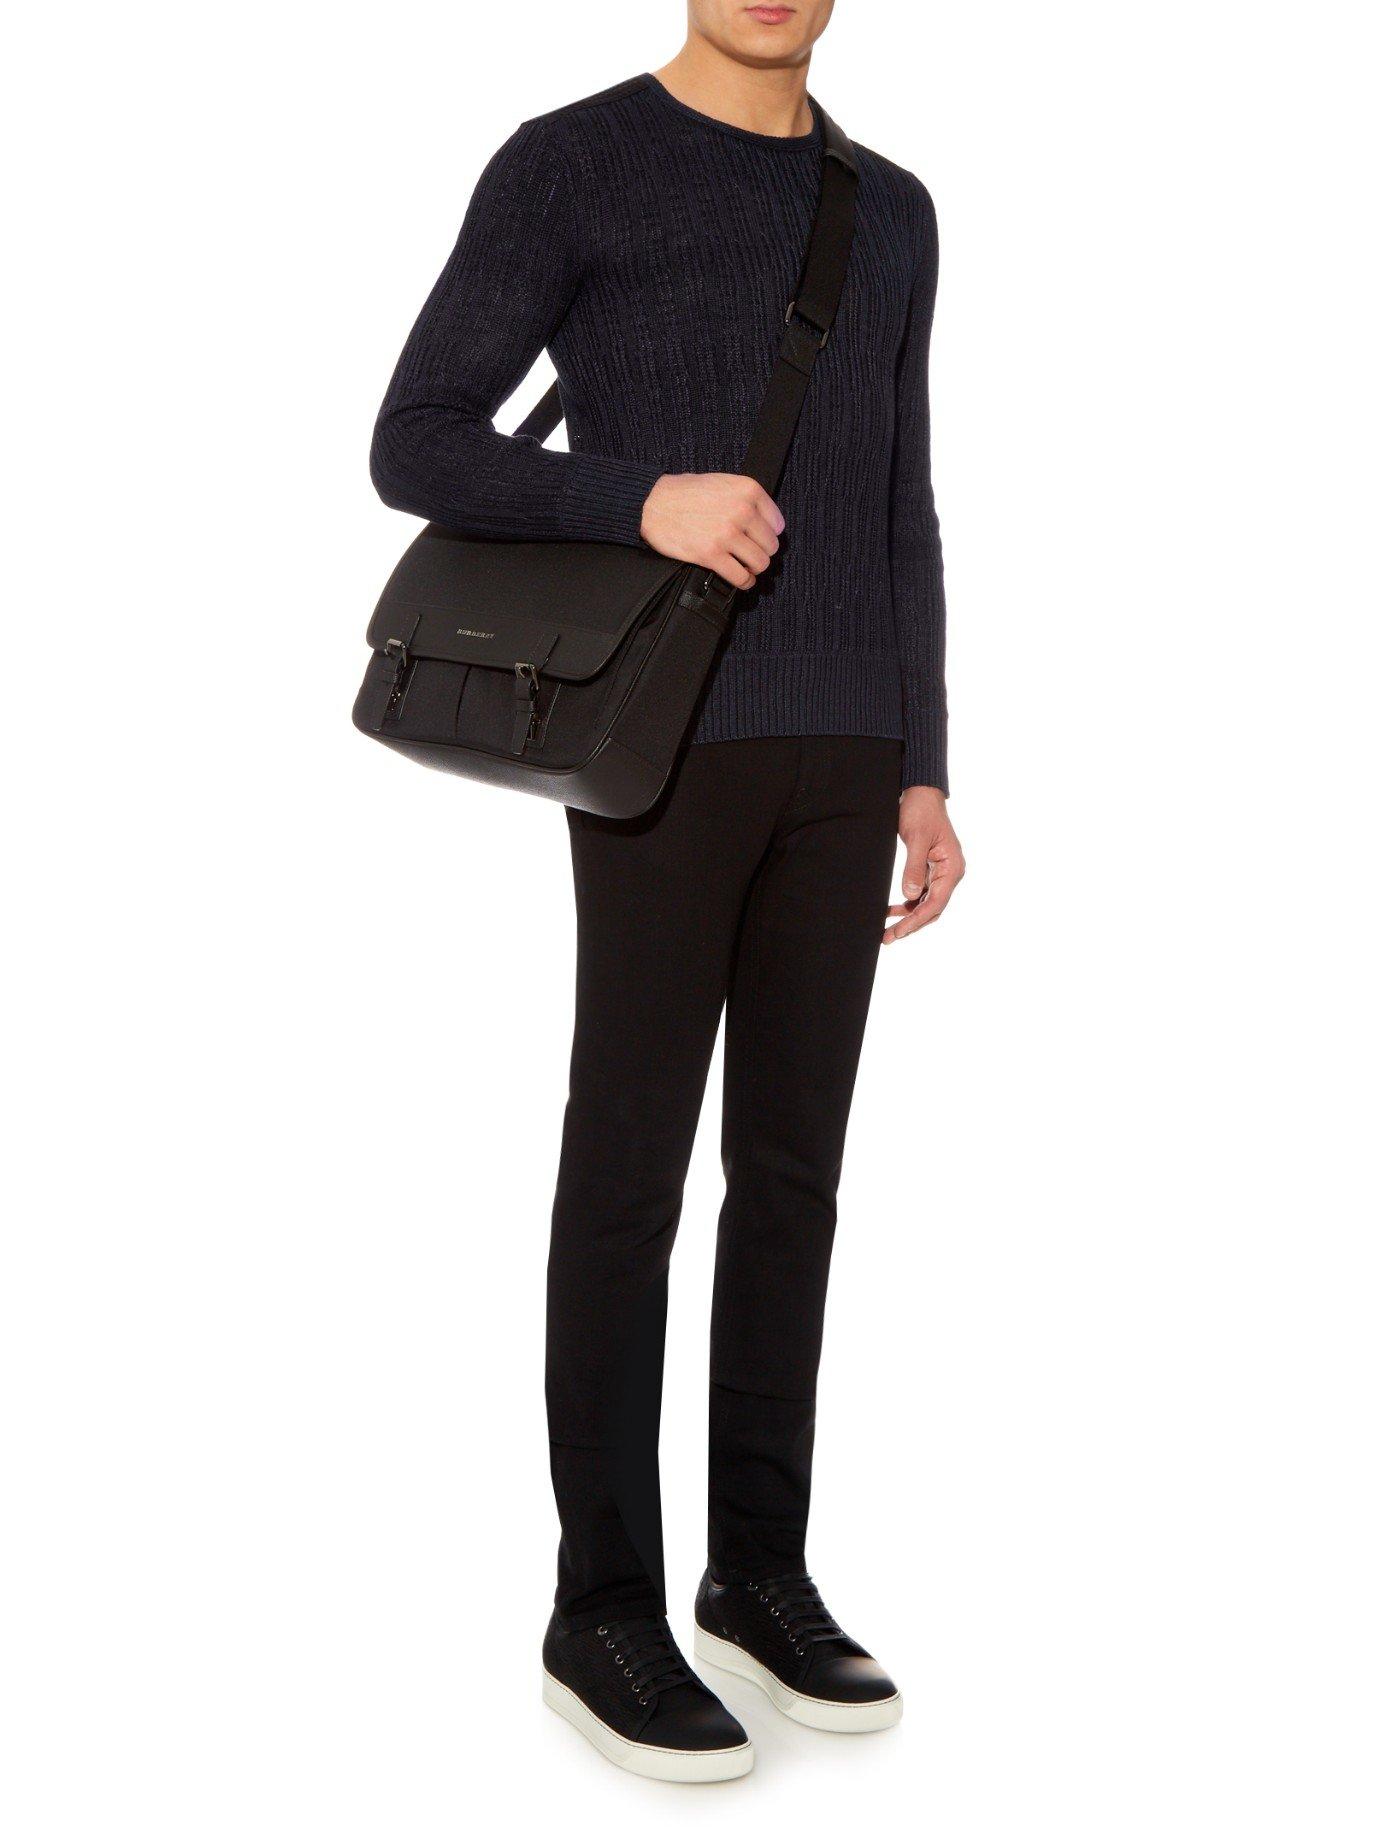 Lyst - Burberry Leather Trimmed Nylon Messenger Bag in Black for Men ada78f12049c3